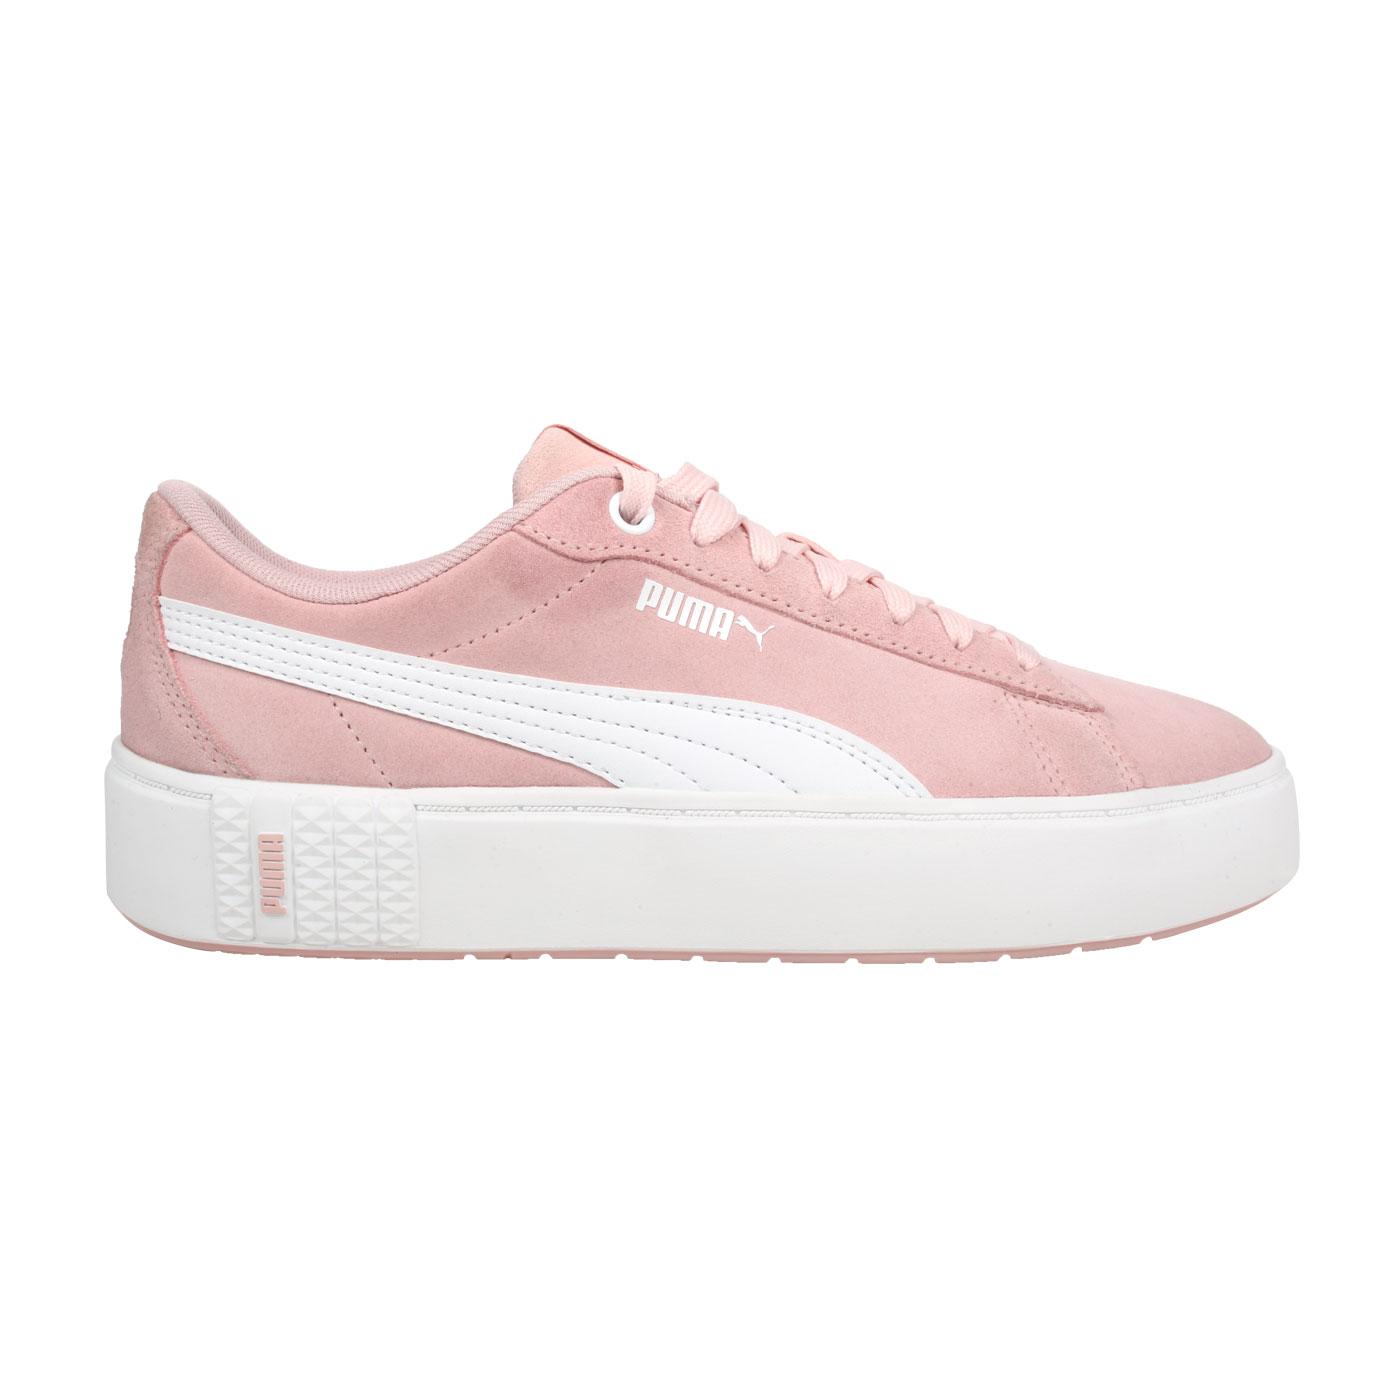 PUMA 女款休閒運動鞋  @Smash Platform v2 SD@37303704 - 粉紅白